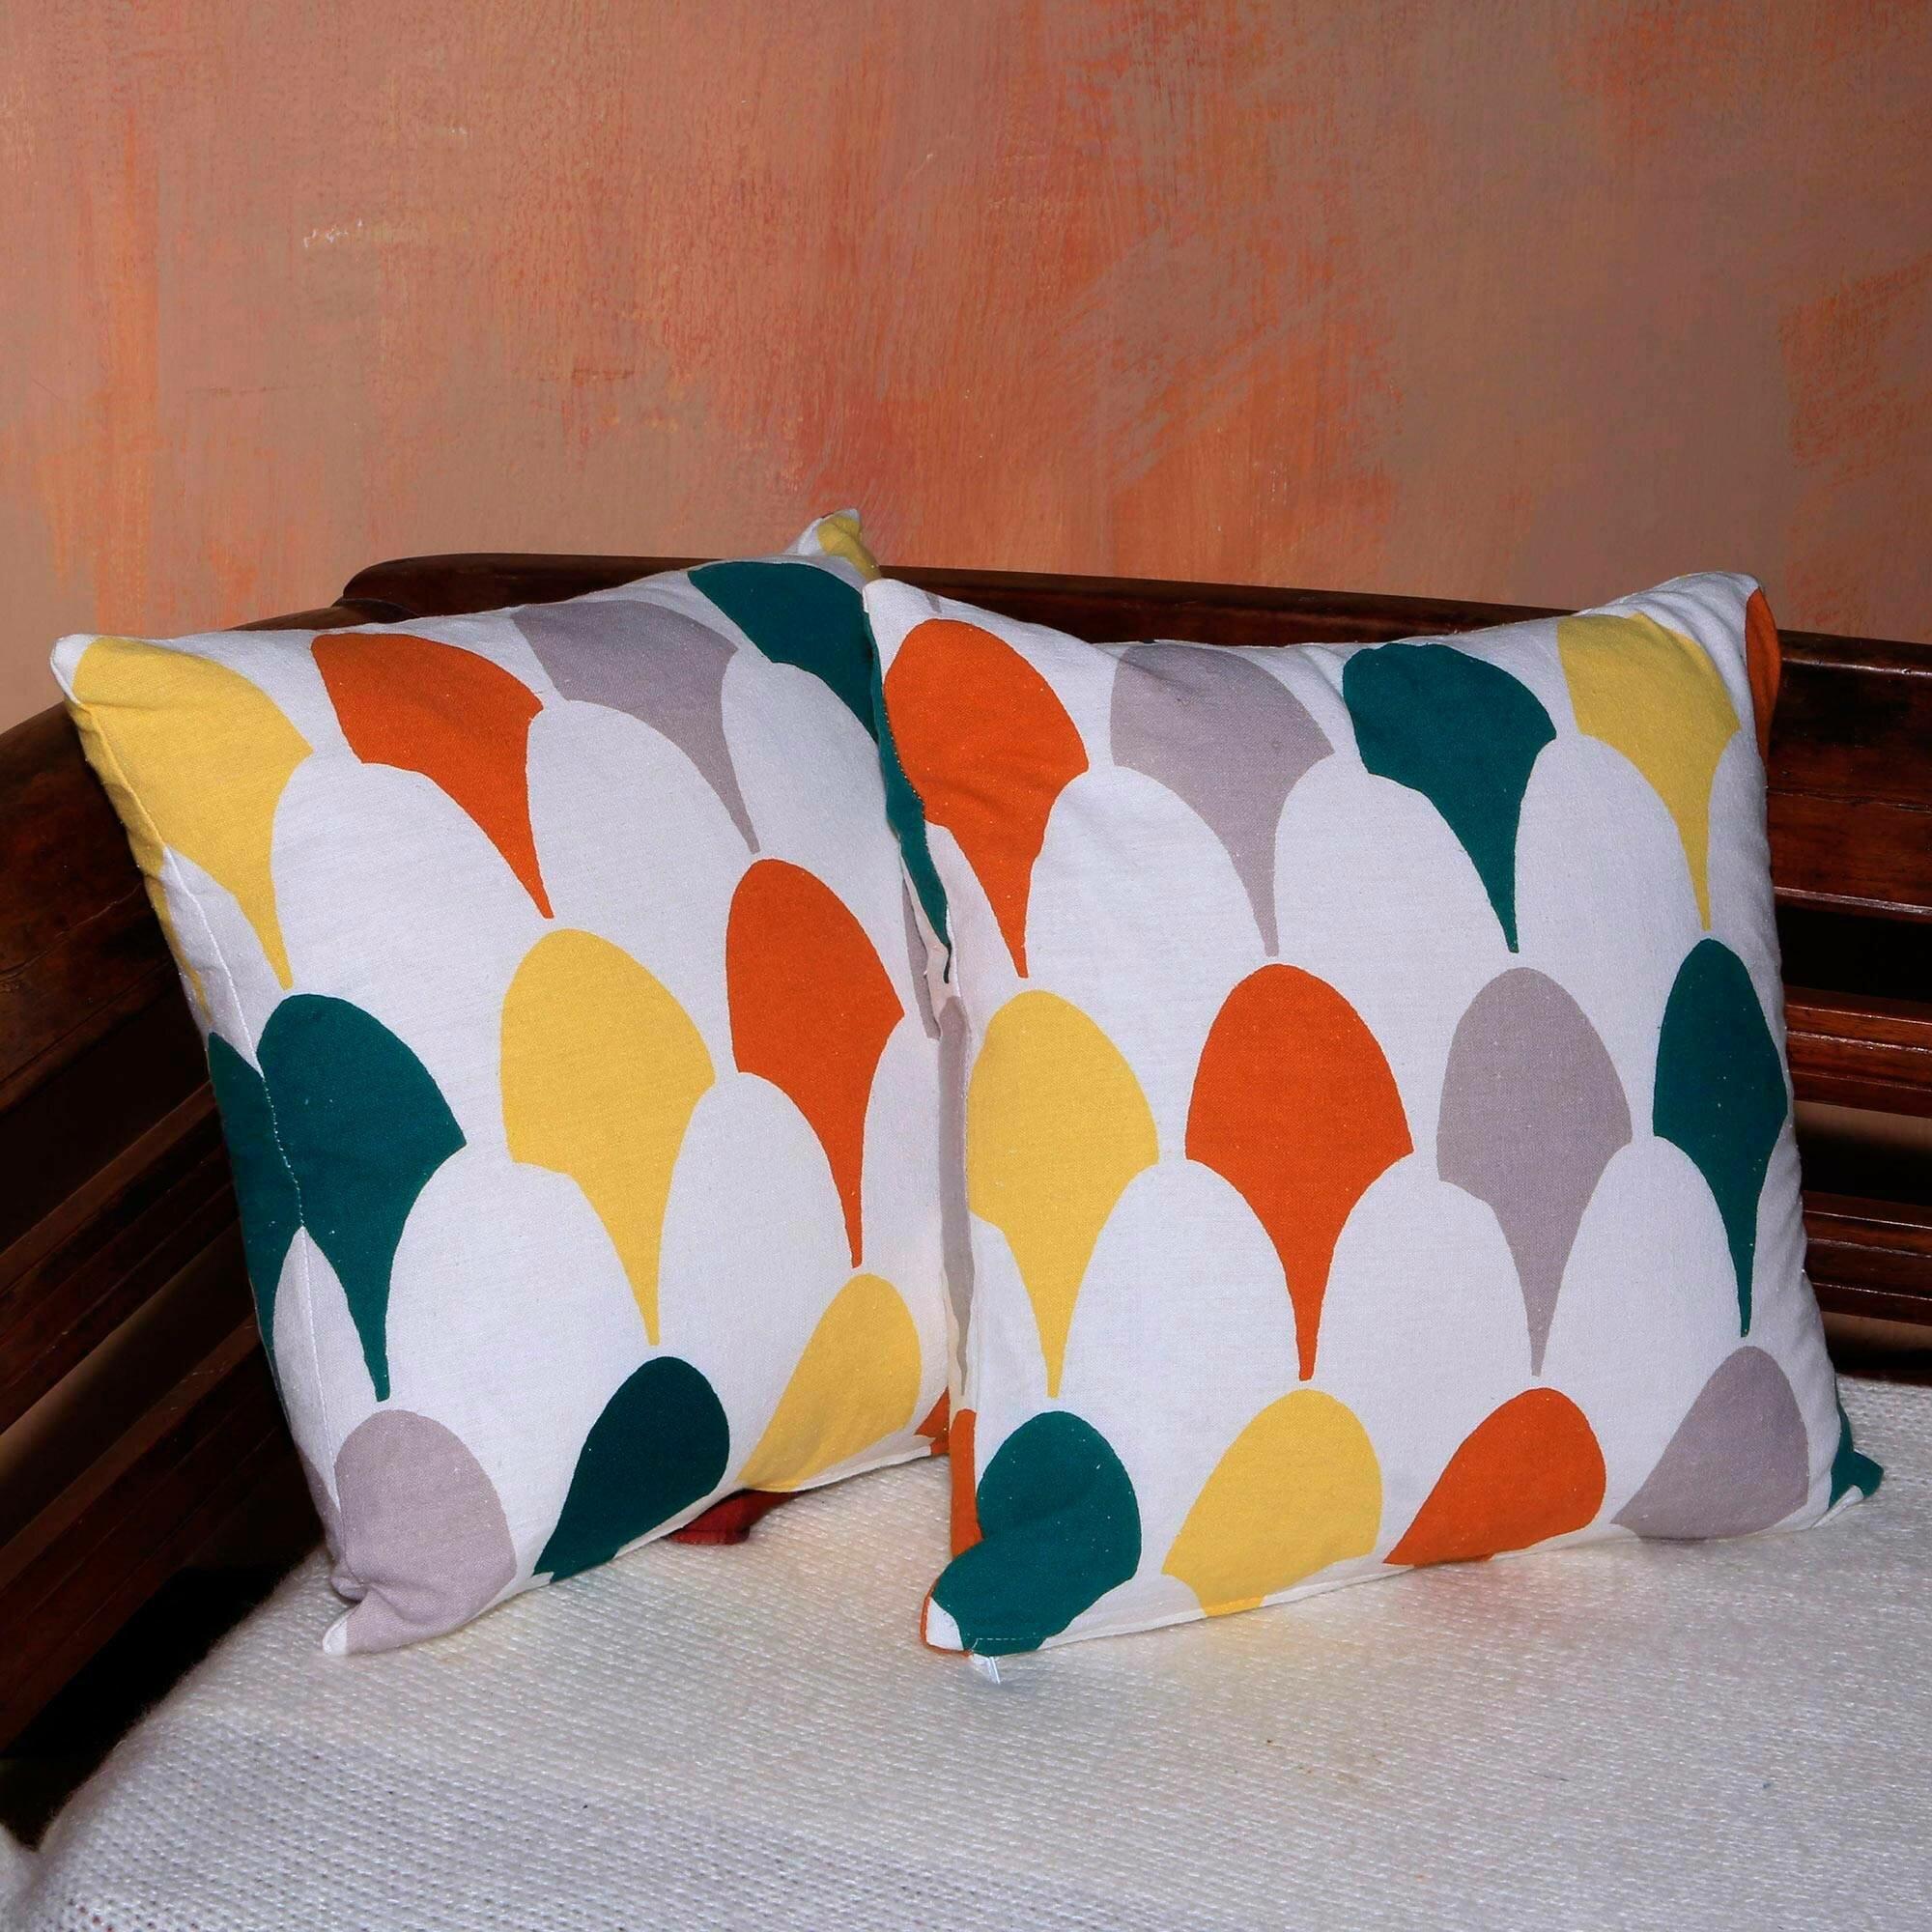 Ebern Designs Karesinda Cotton 17 75 Throw Pillow Cover Wayfair